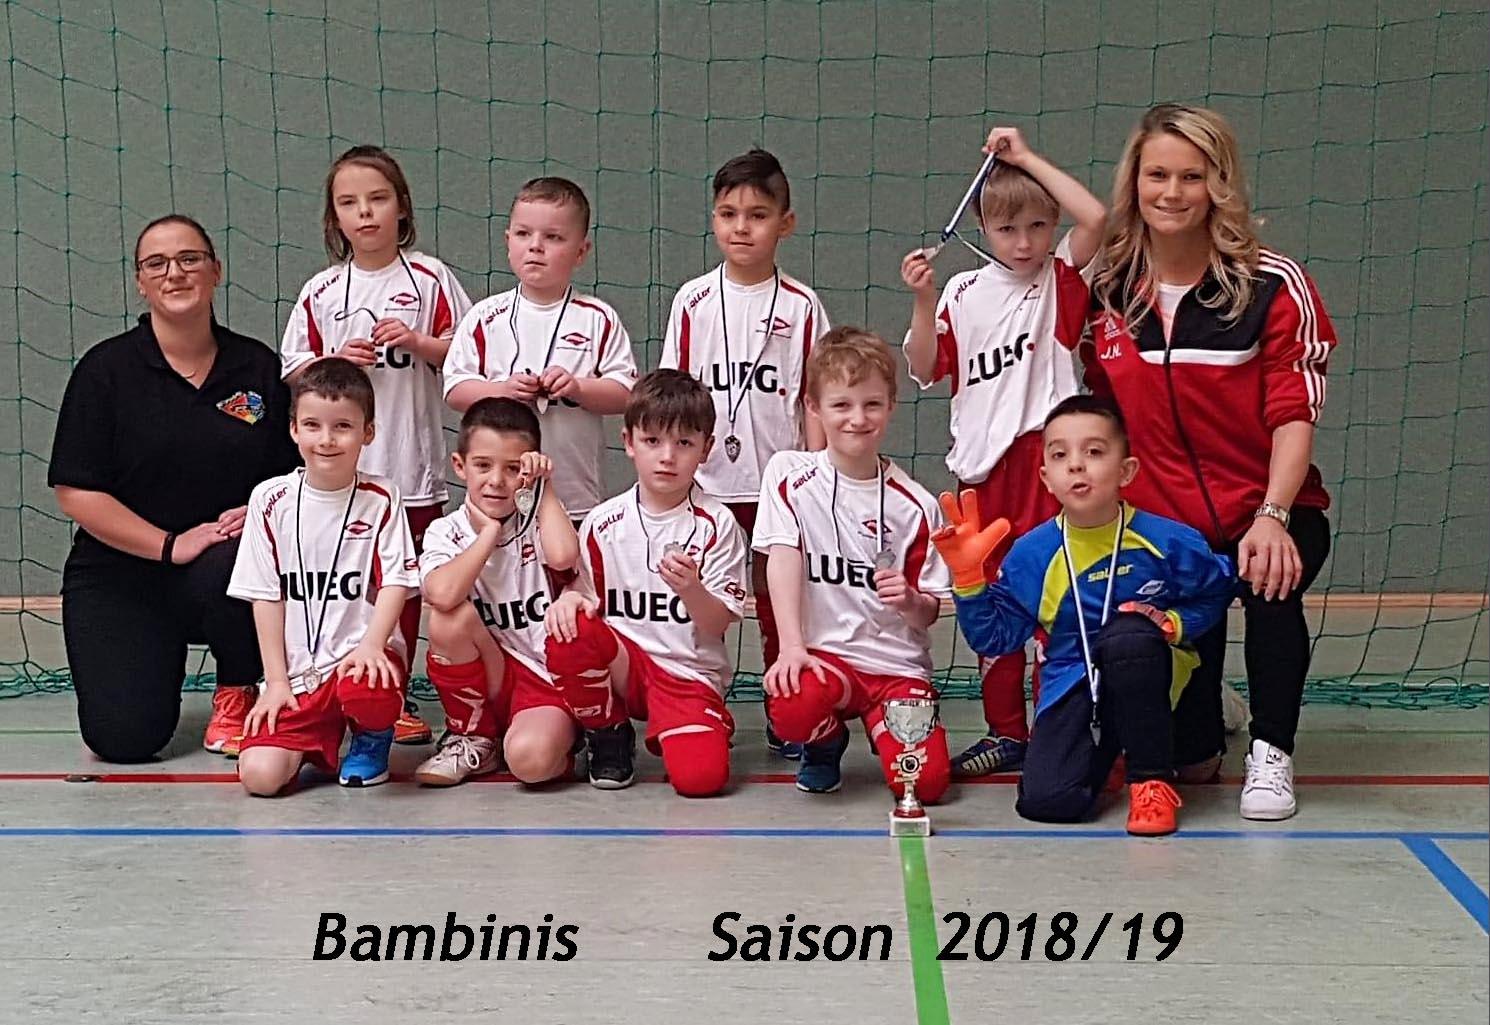 Bambinis-Saison-2018-2019 Kopie